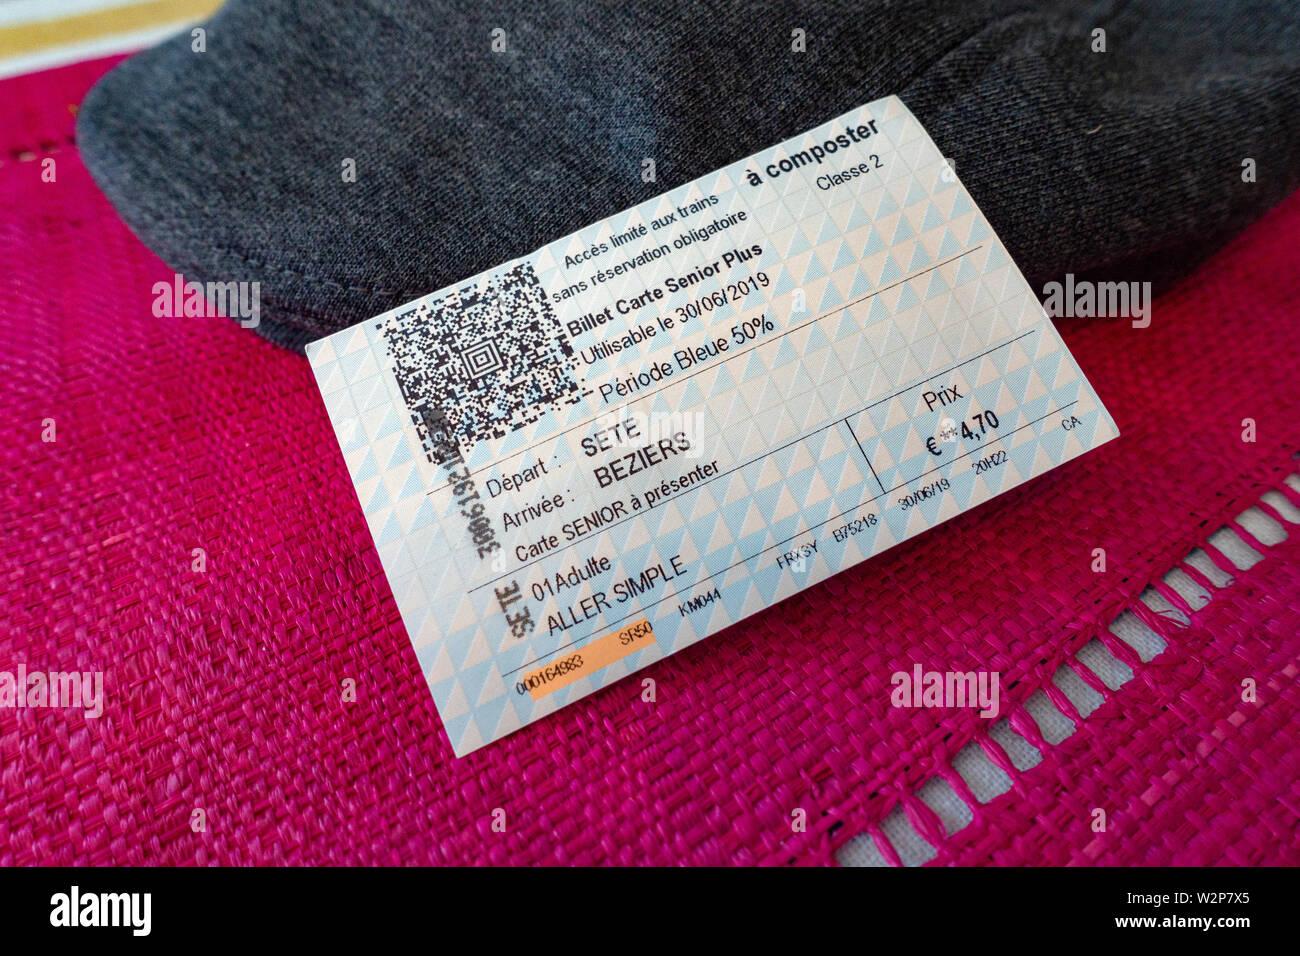 carte senior plus sncf Senior Citizen railway ticket including discount for SNCF Railway